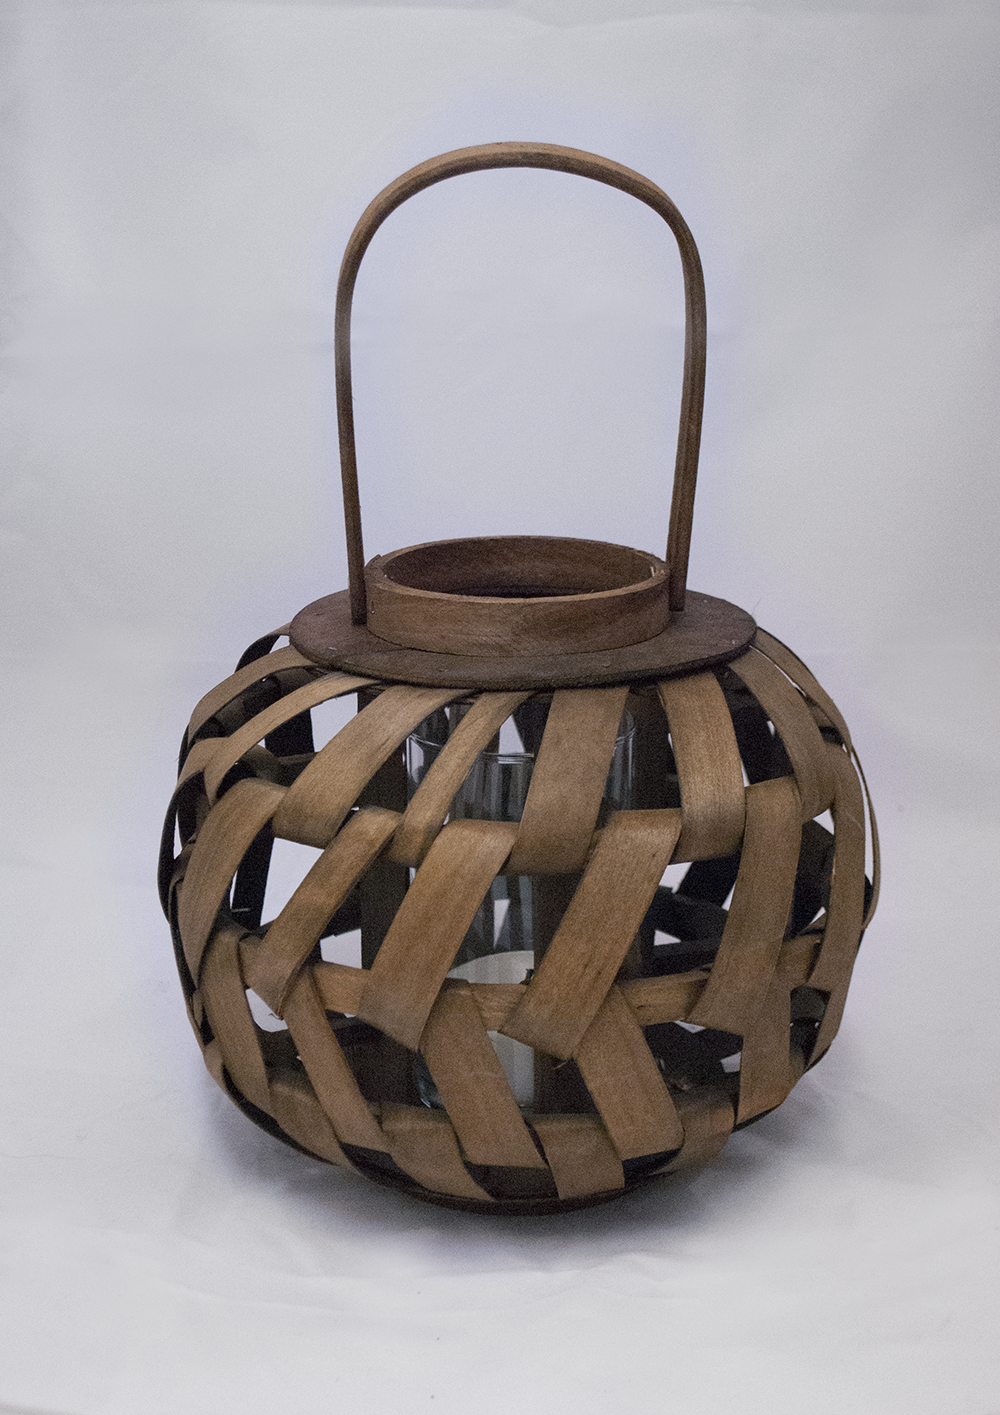 koko Lantern (round)  weaved wood + glass cylinder  Quantity: 2  Price: $20.00